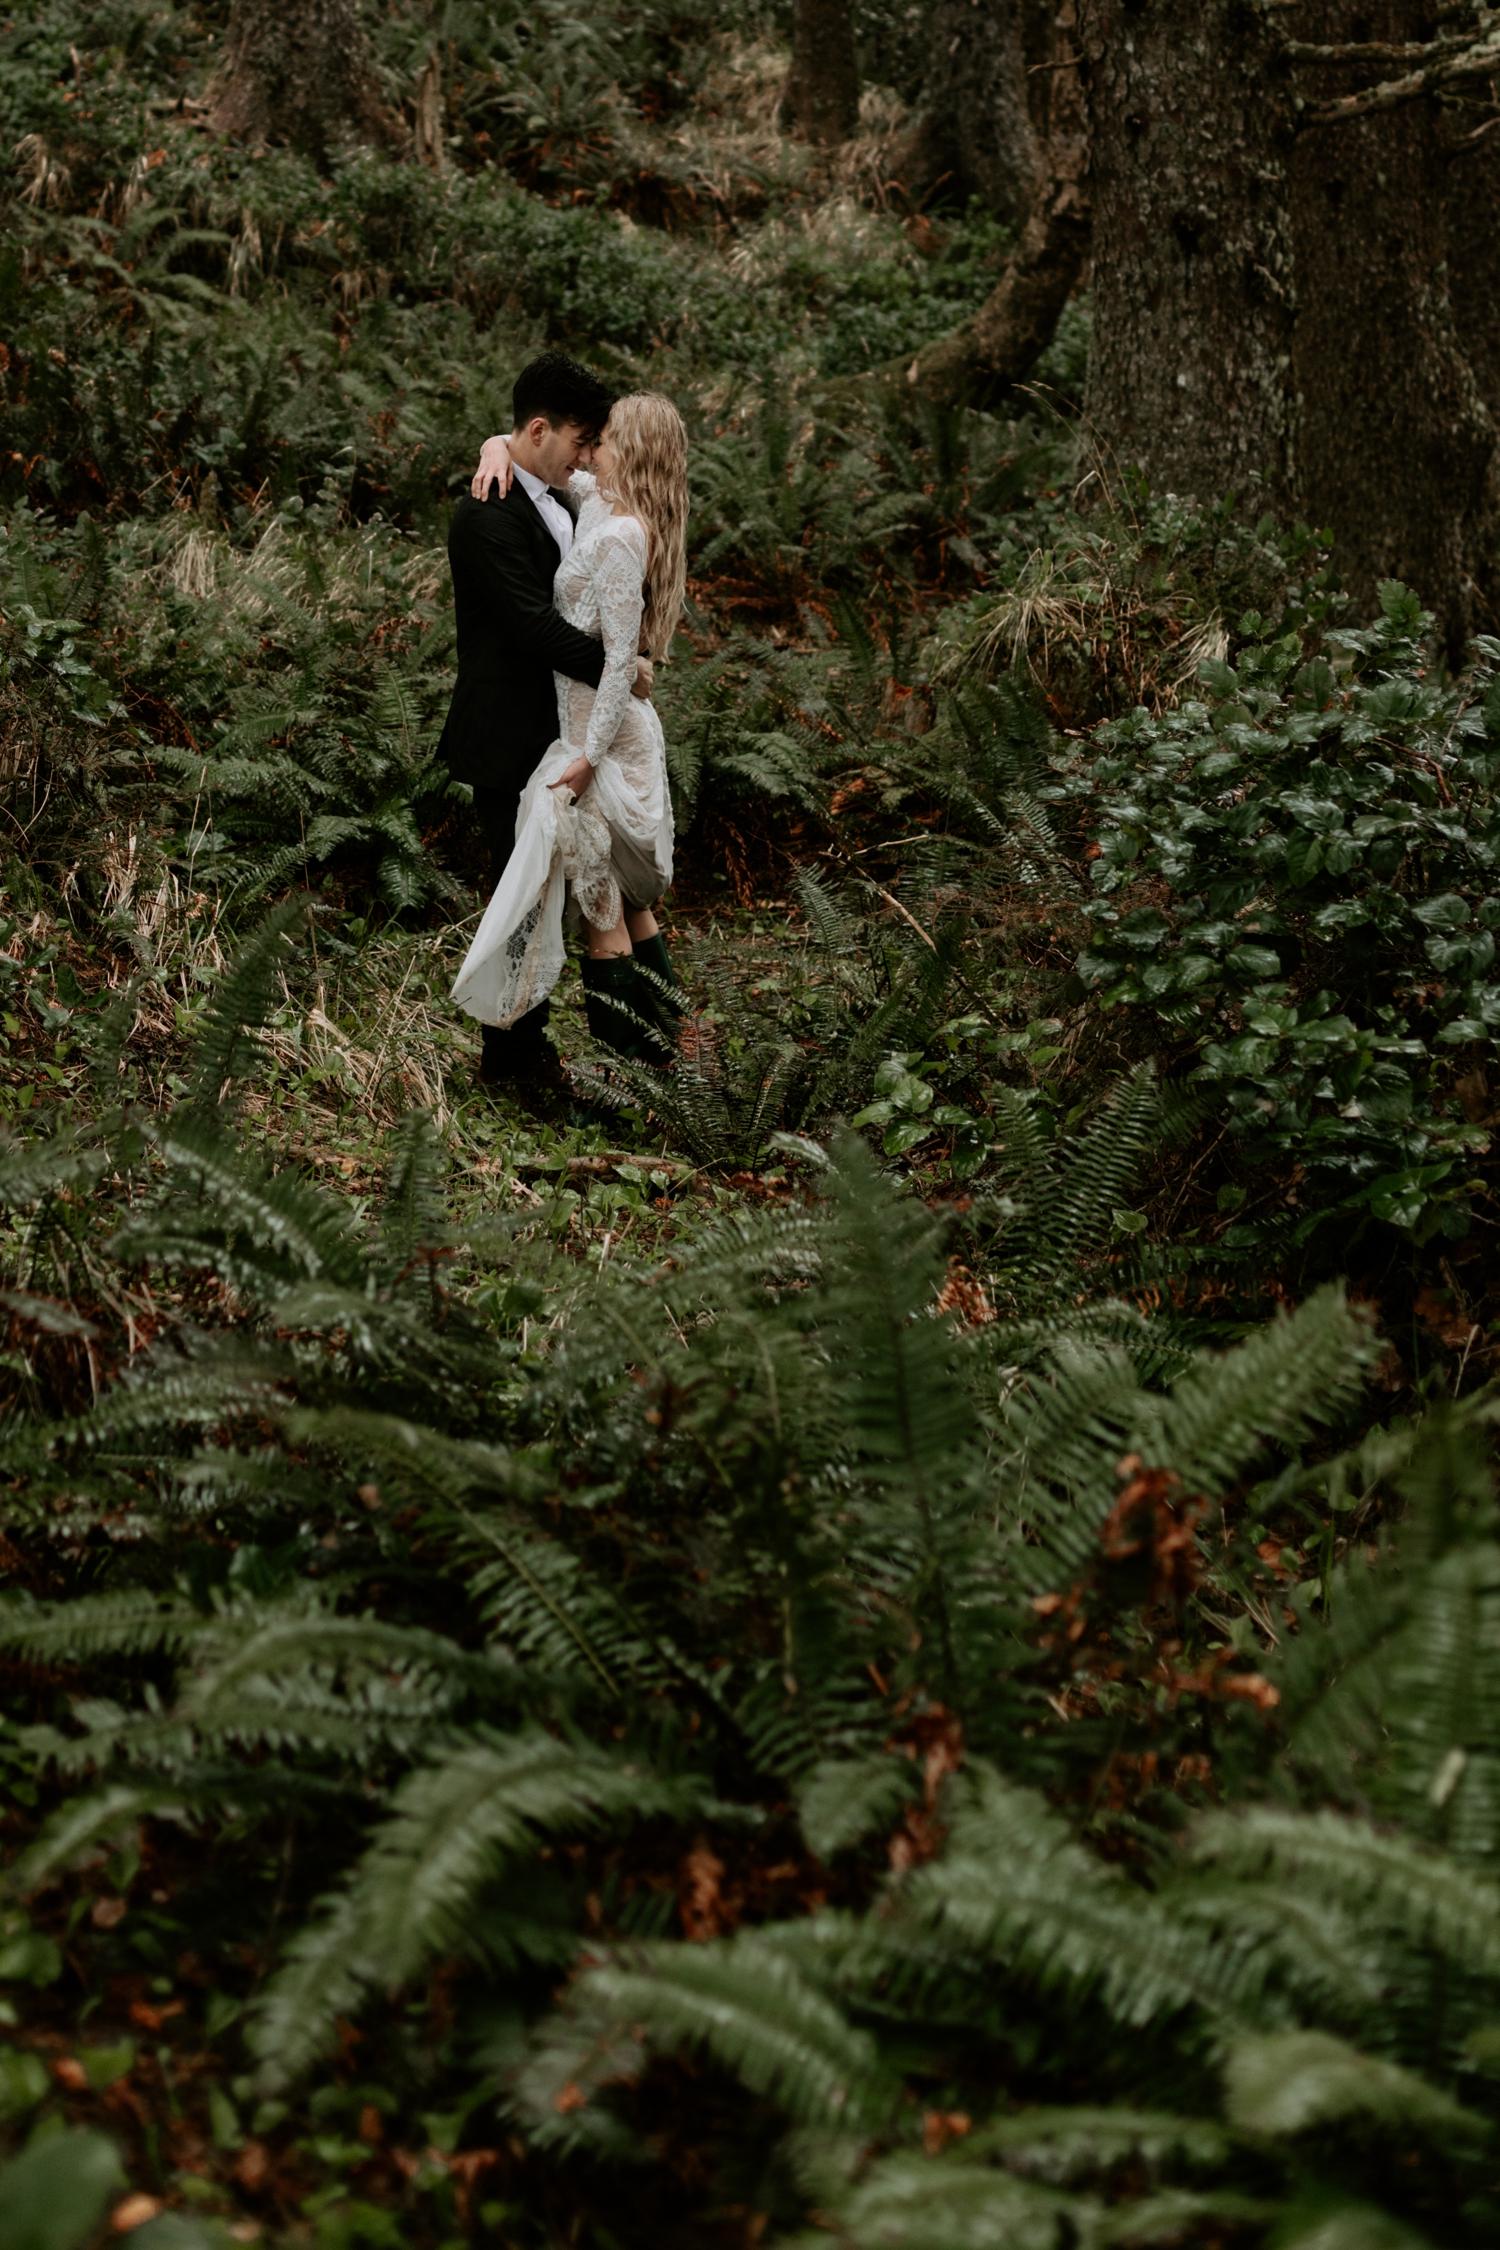 pnw-adventure-wedding-photographer-2018-05-02_0078.jpg